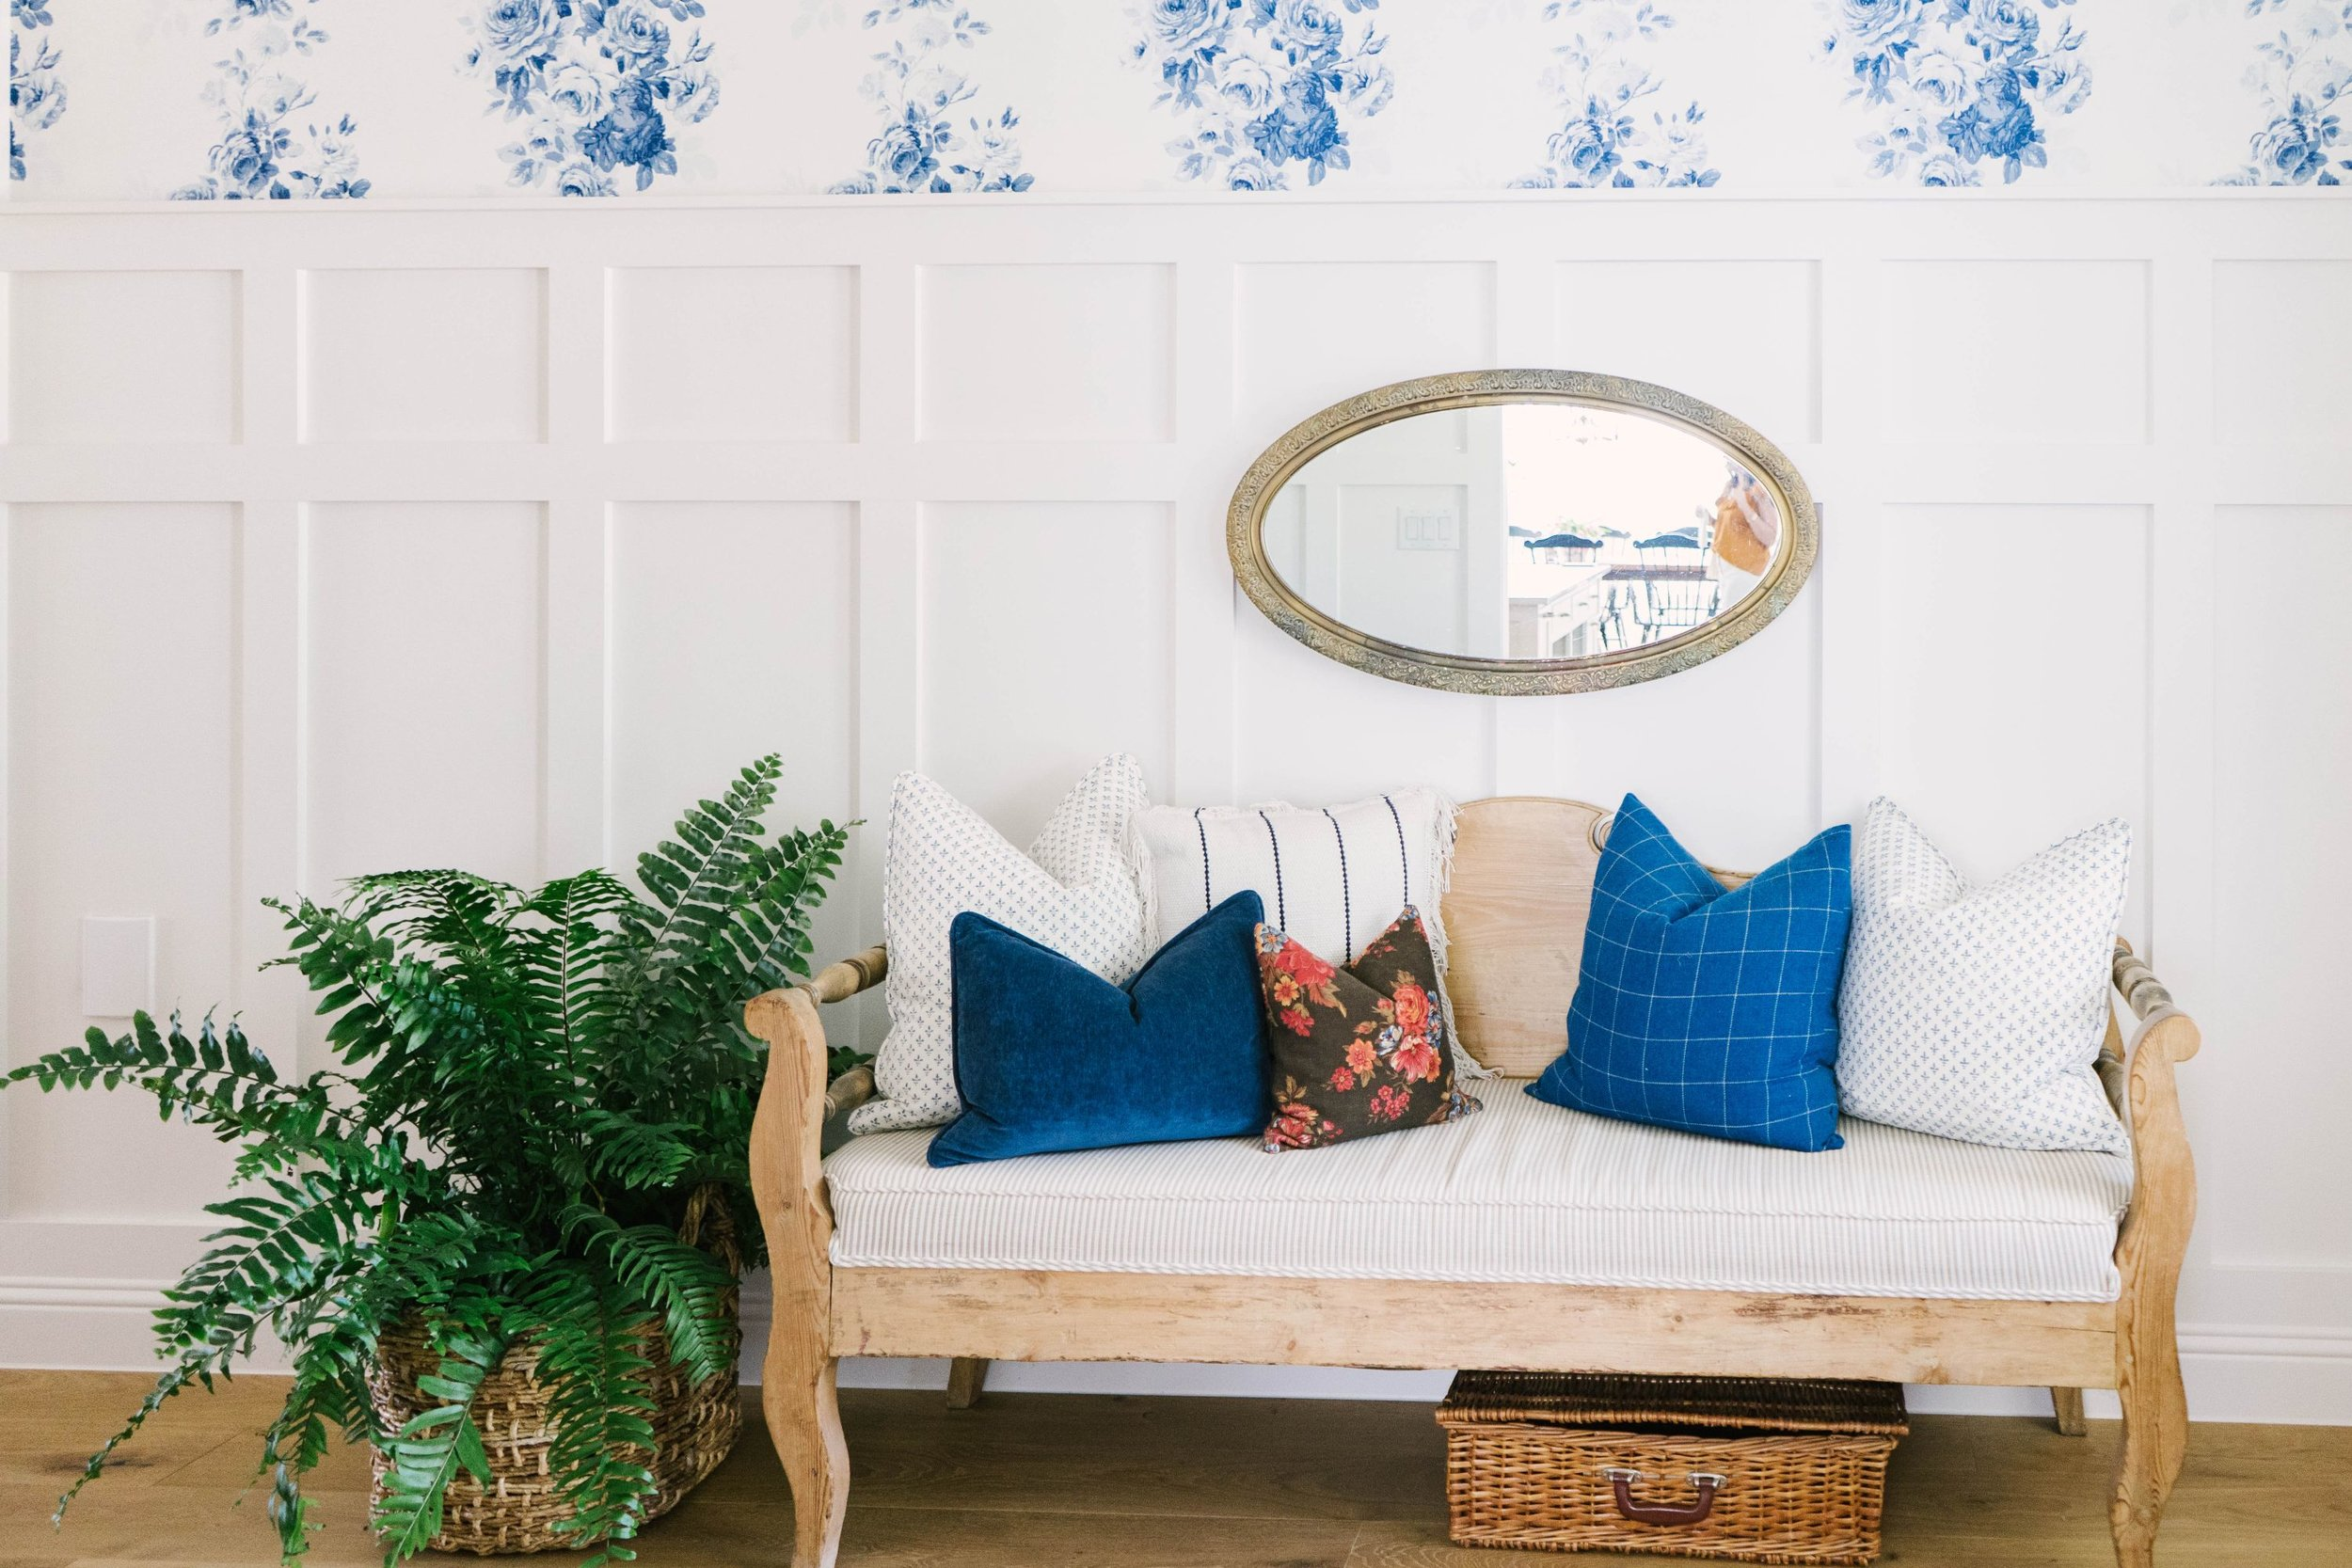 Classic Farmhouse Home Tour - Farmhouse Entryway - Blue Floral Wall Paper